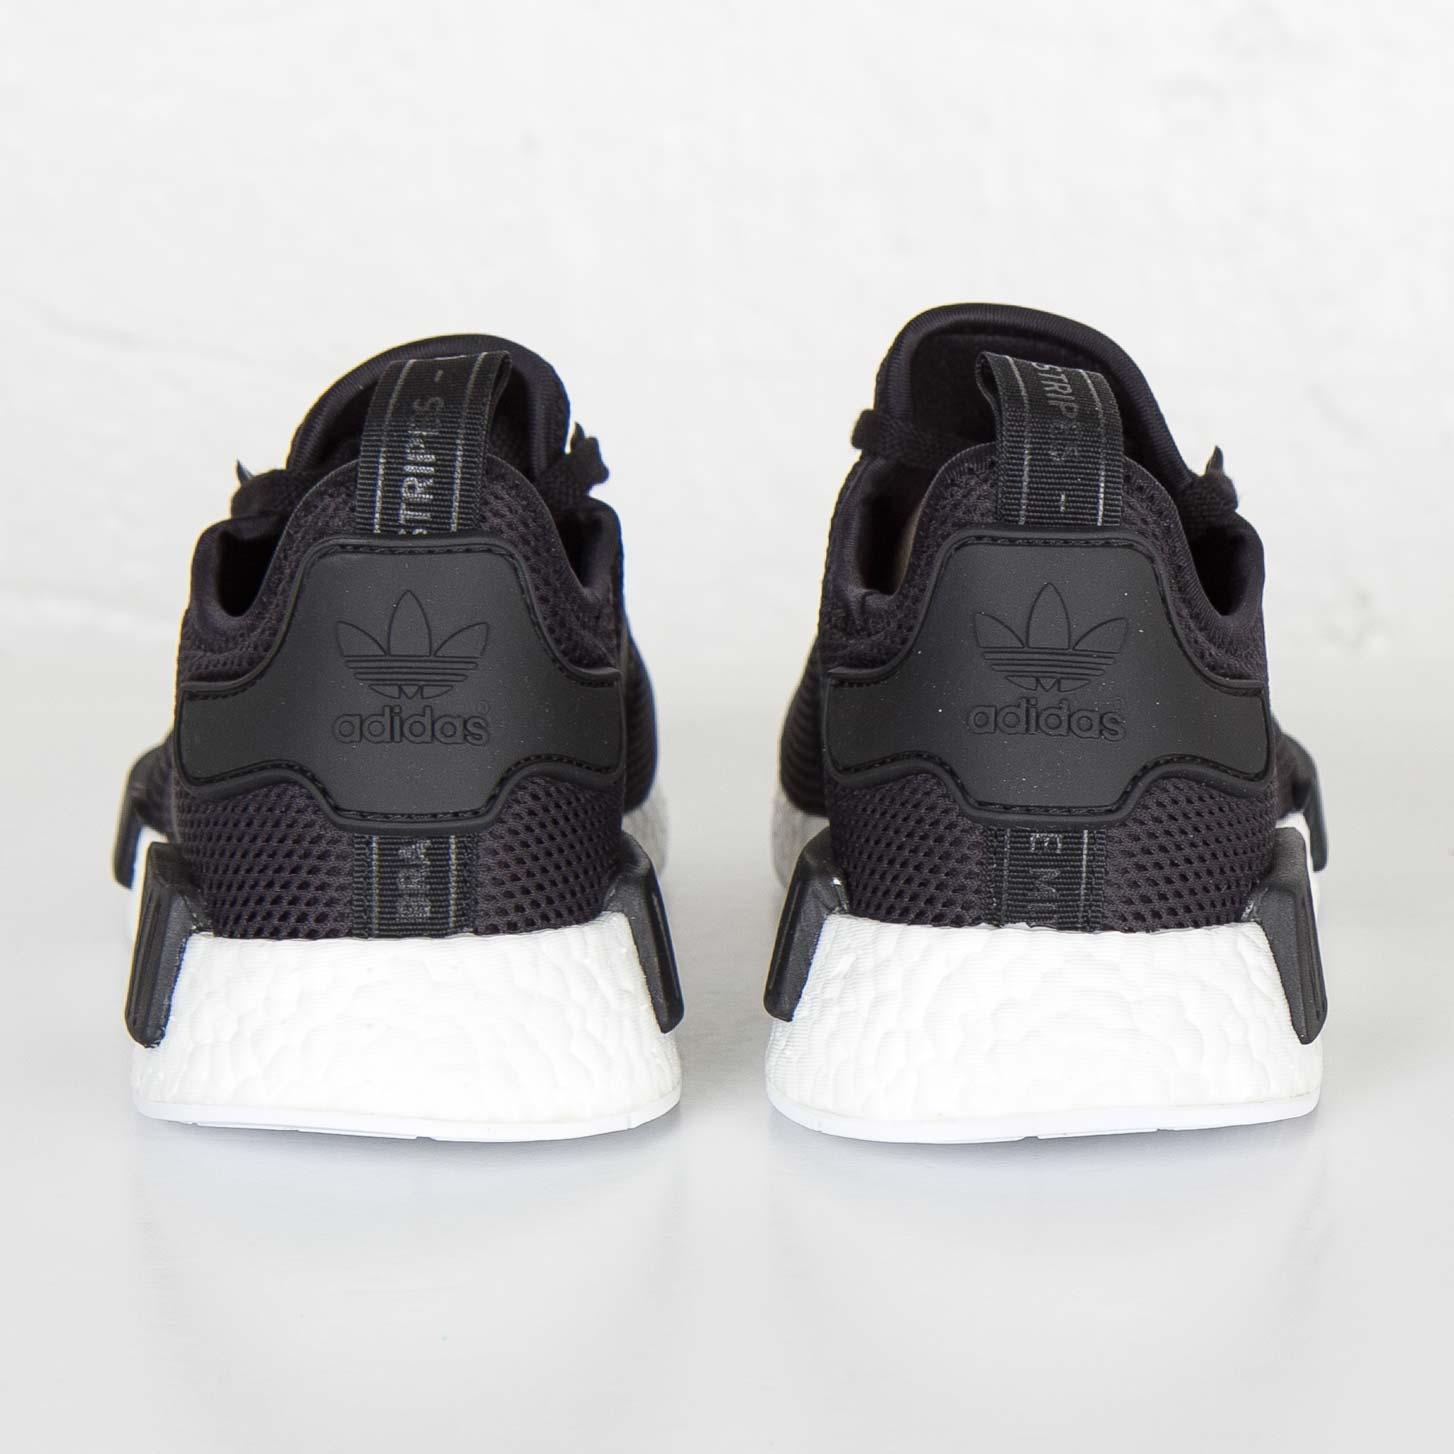 adidas nmd r1 s79165 sneakersnstuff scarpe & streetwear